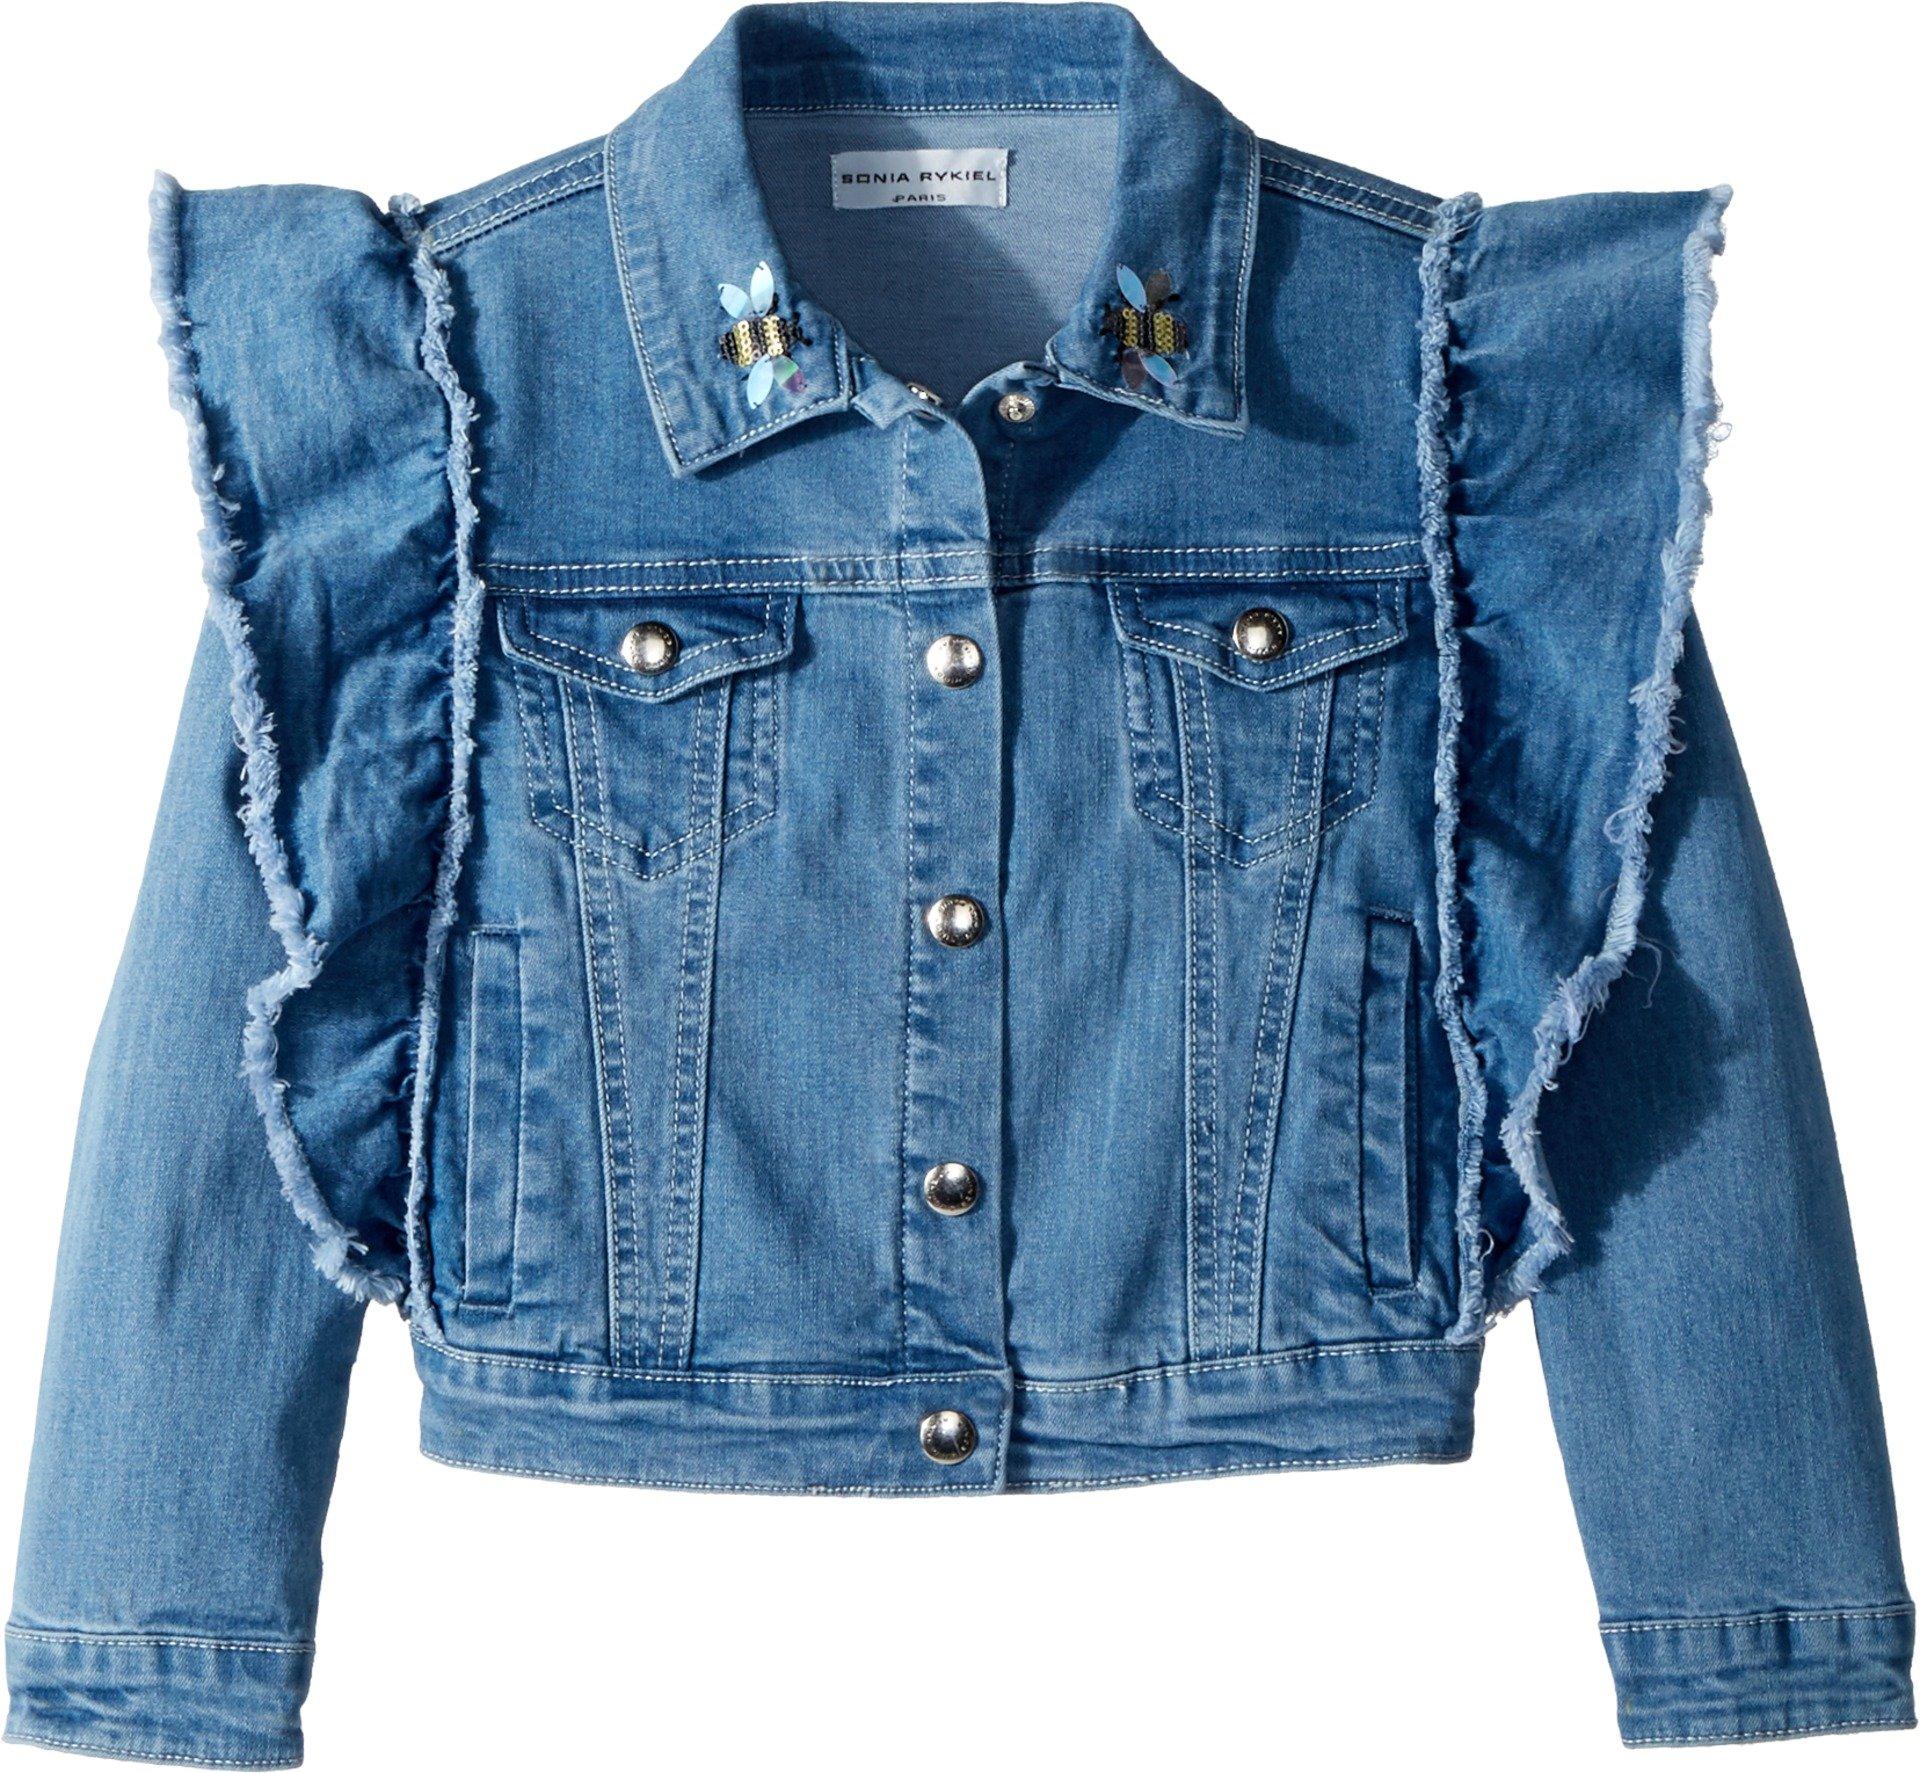 Sonia Rykiel Kids Girl's Anny Denim Jacket (Little Kids/Big Kids) Light Blue 12 Years